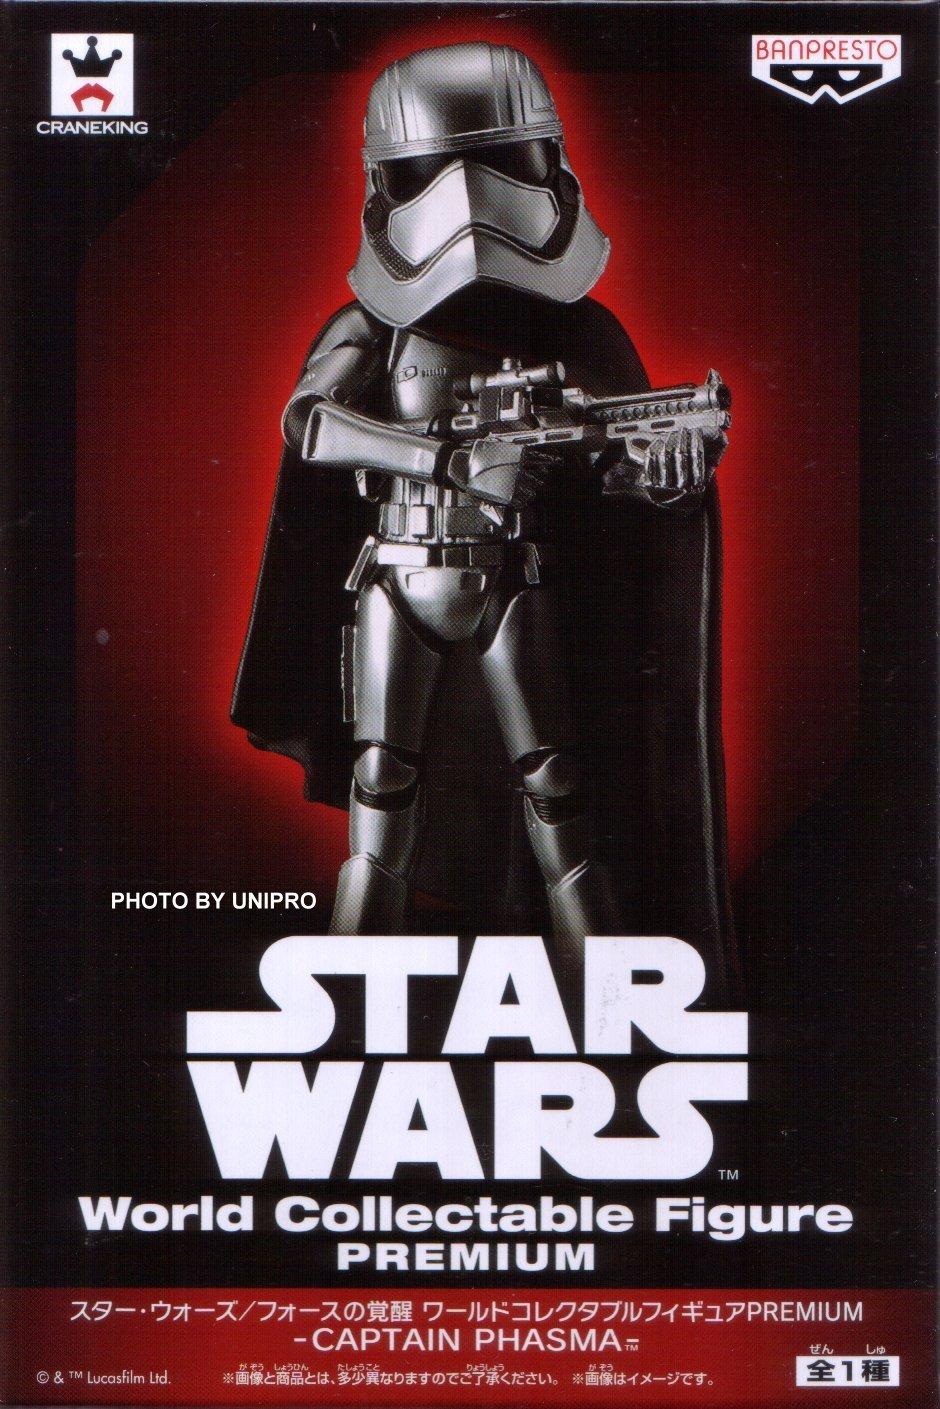 日版 WCF Premium 原力覺醒 普拉斯馬 隊長 - CAPTAIN PHASMA - Star Wars Figure 星際大戰 公仔